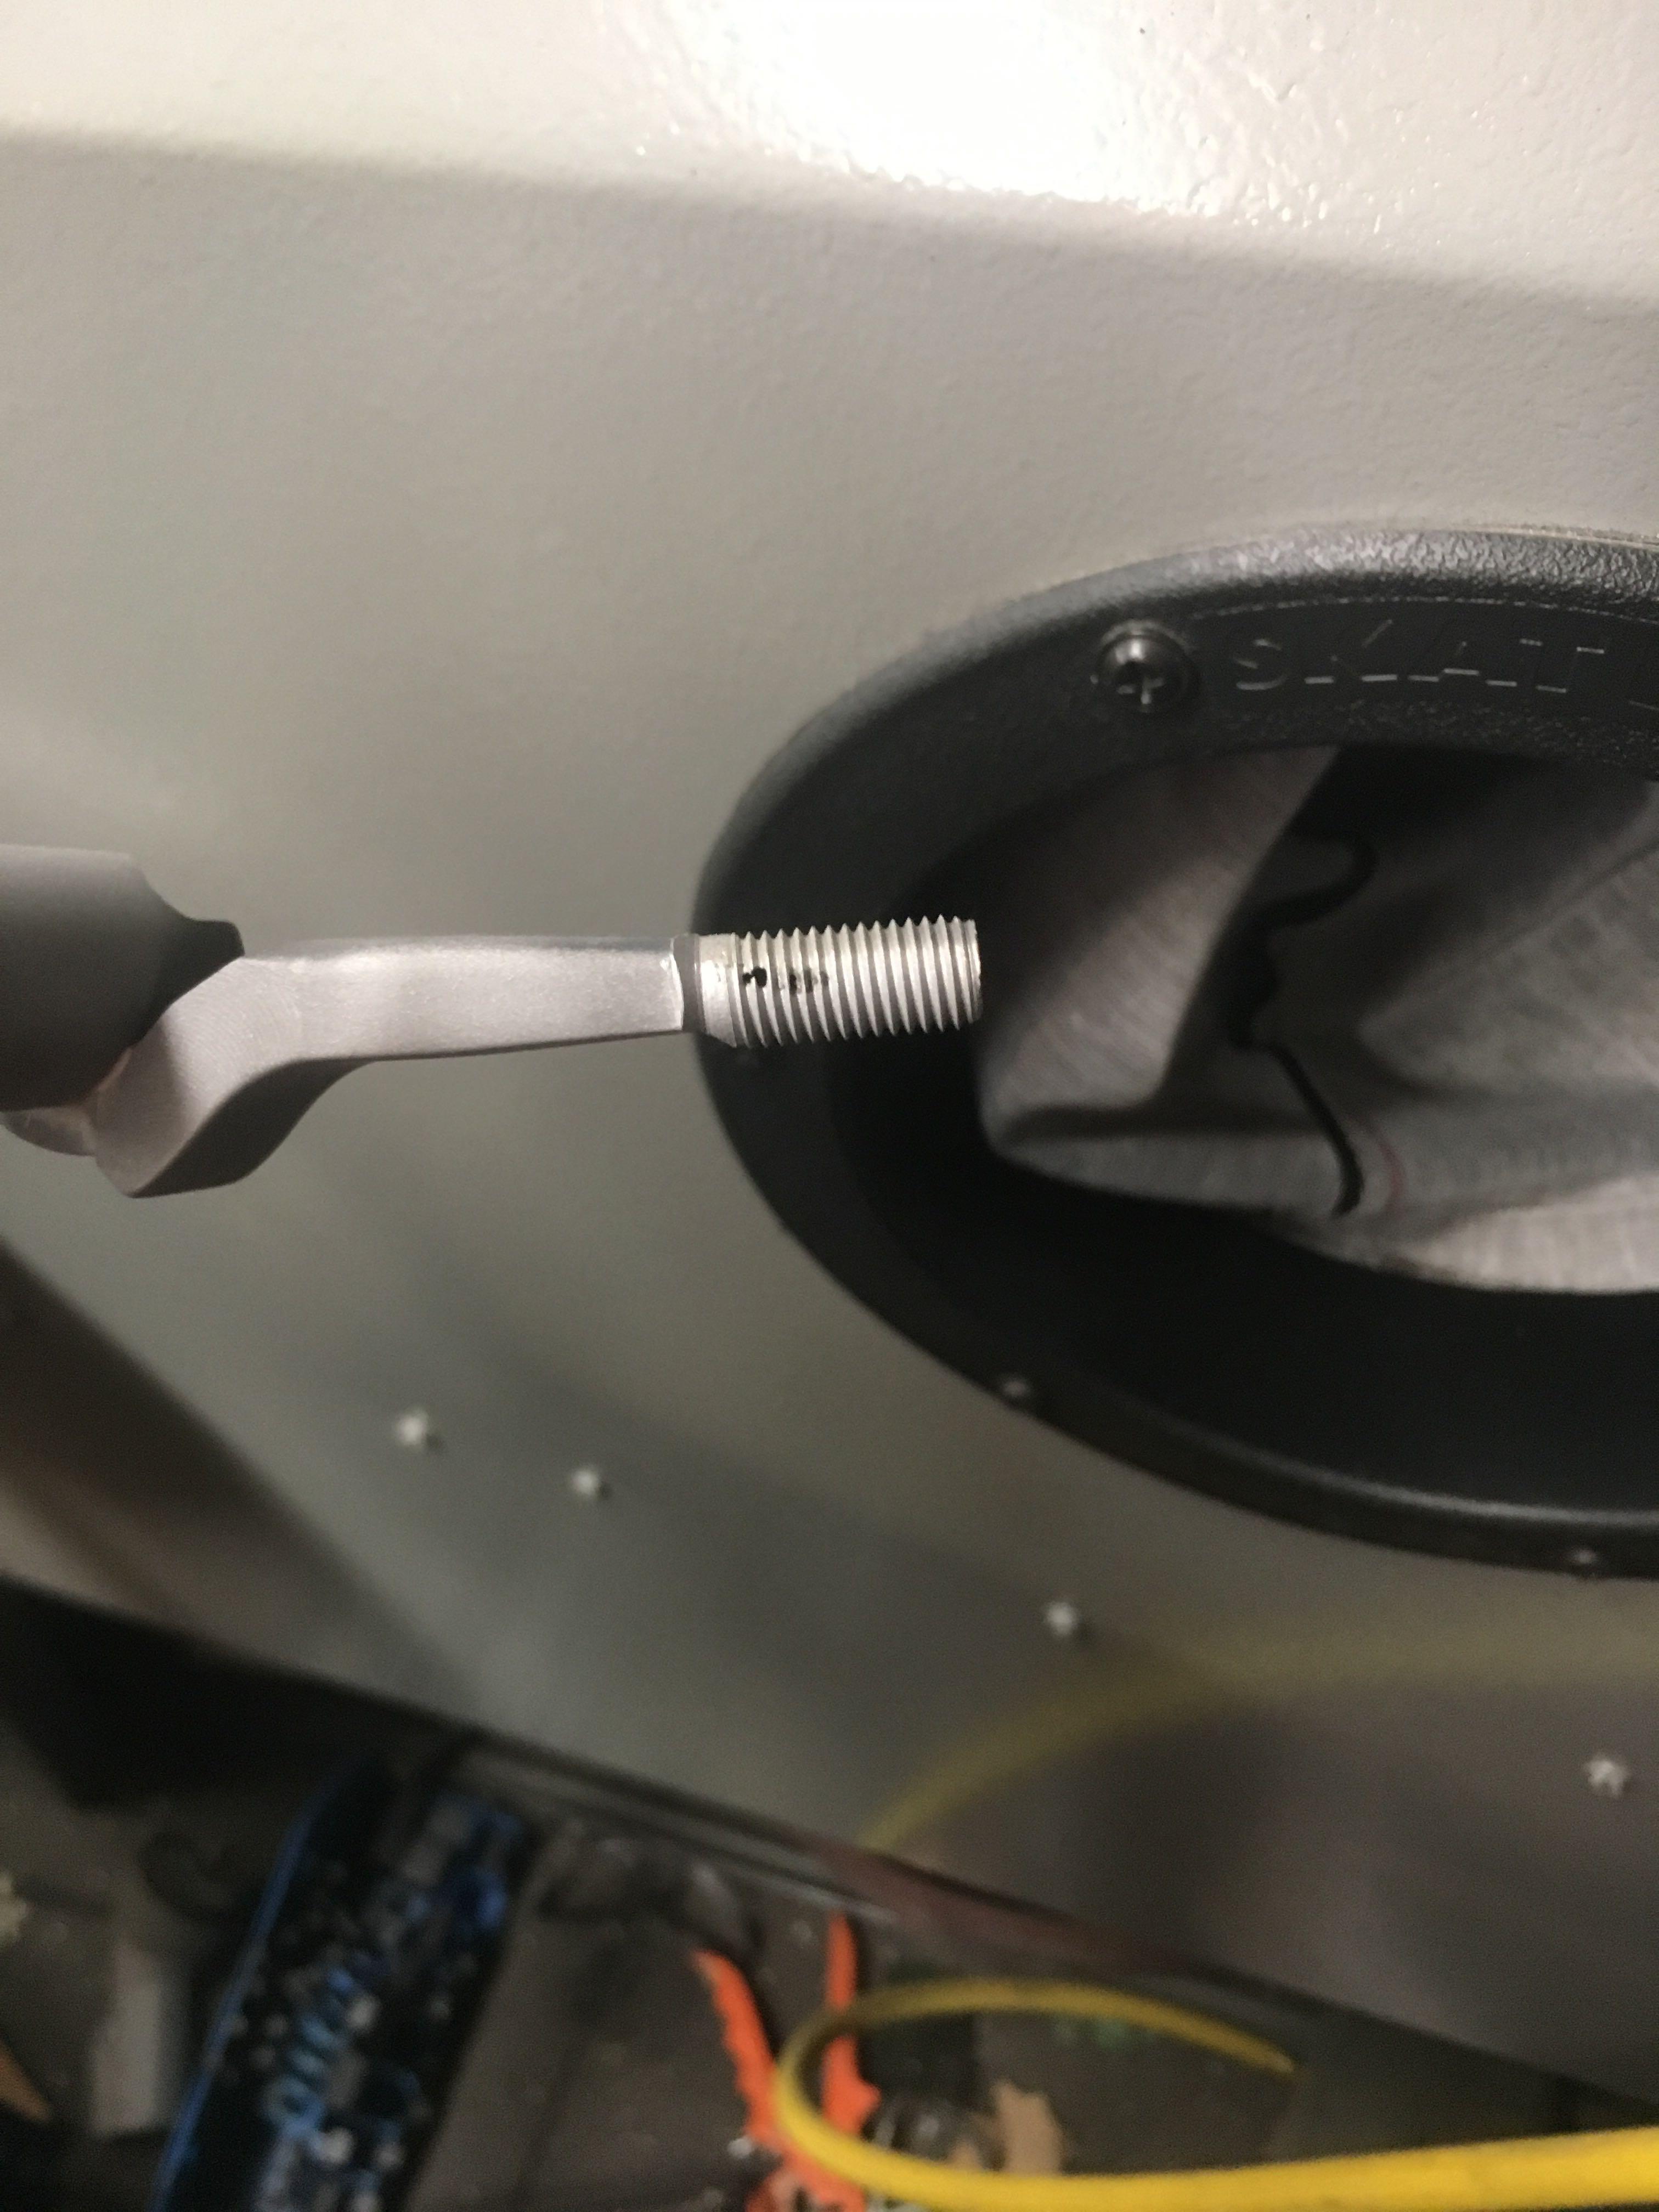 Tactical Operations bolt knob installation on a Remington 700